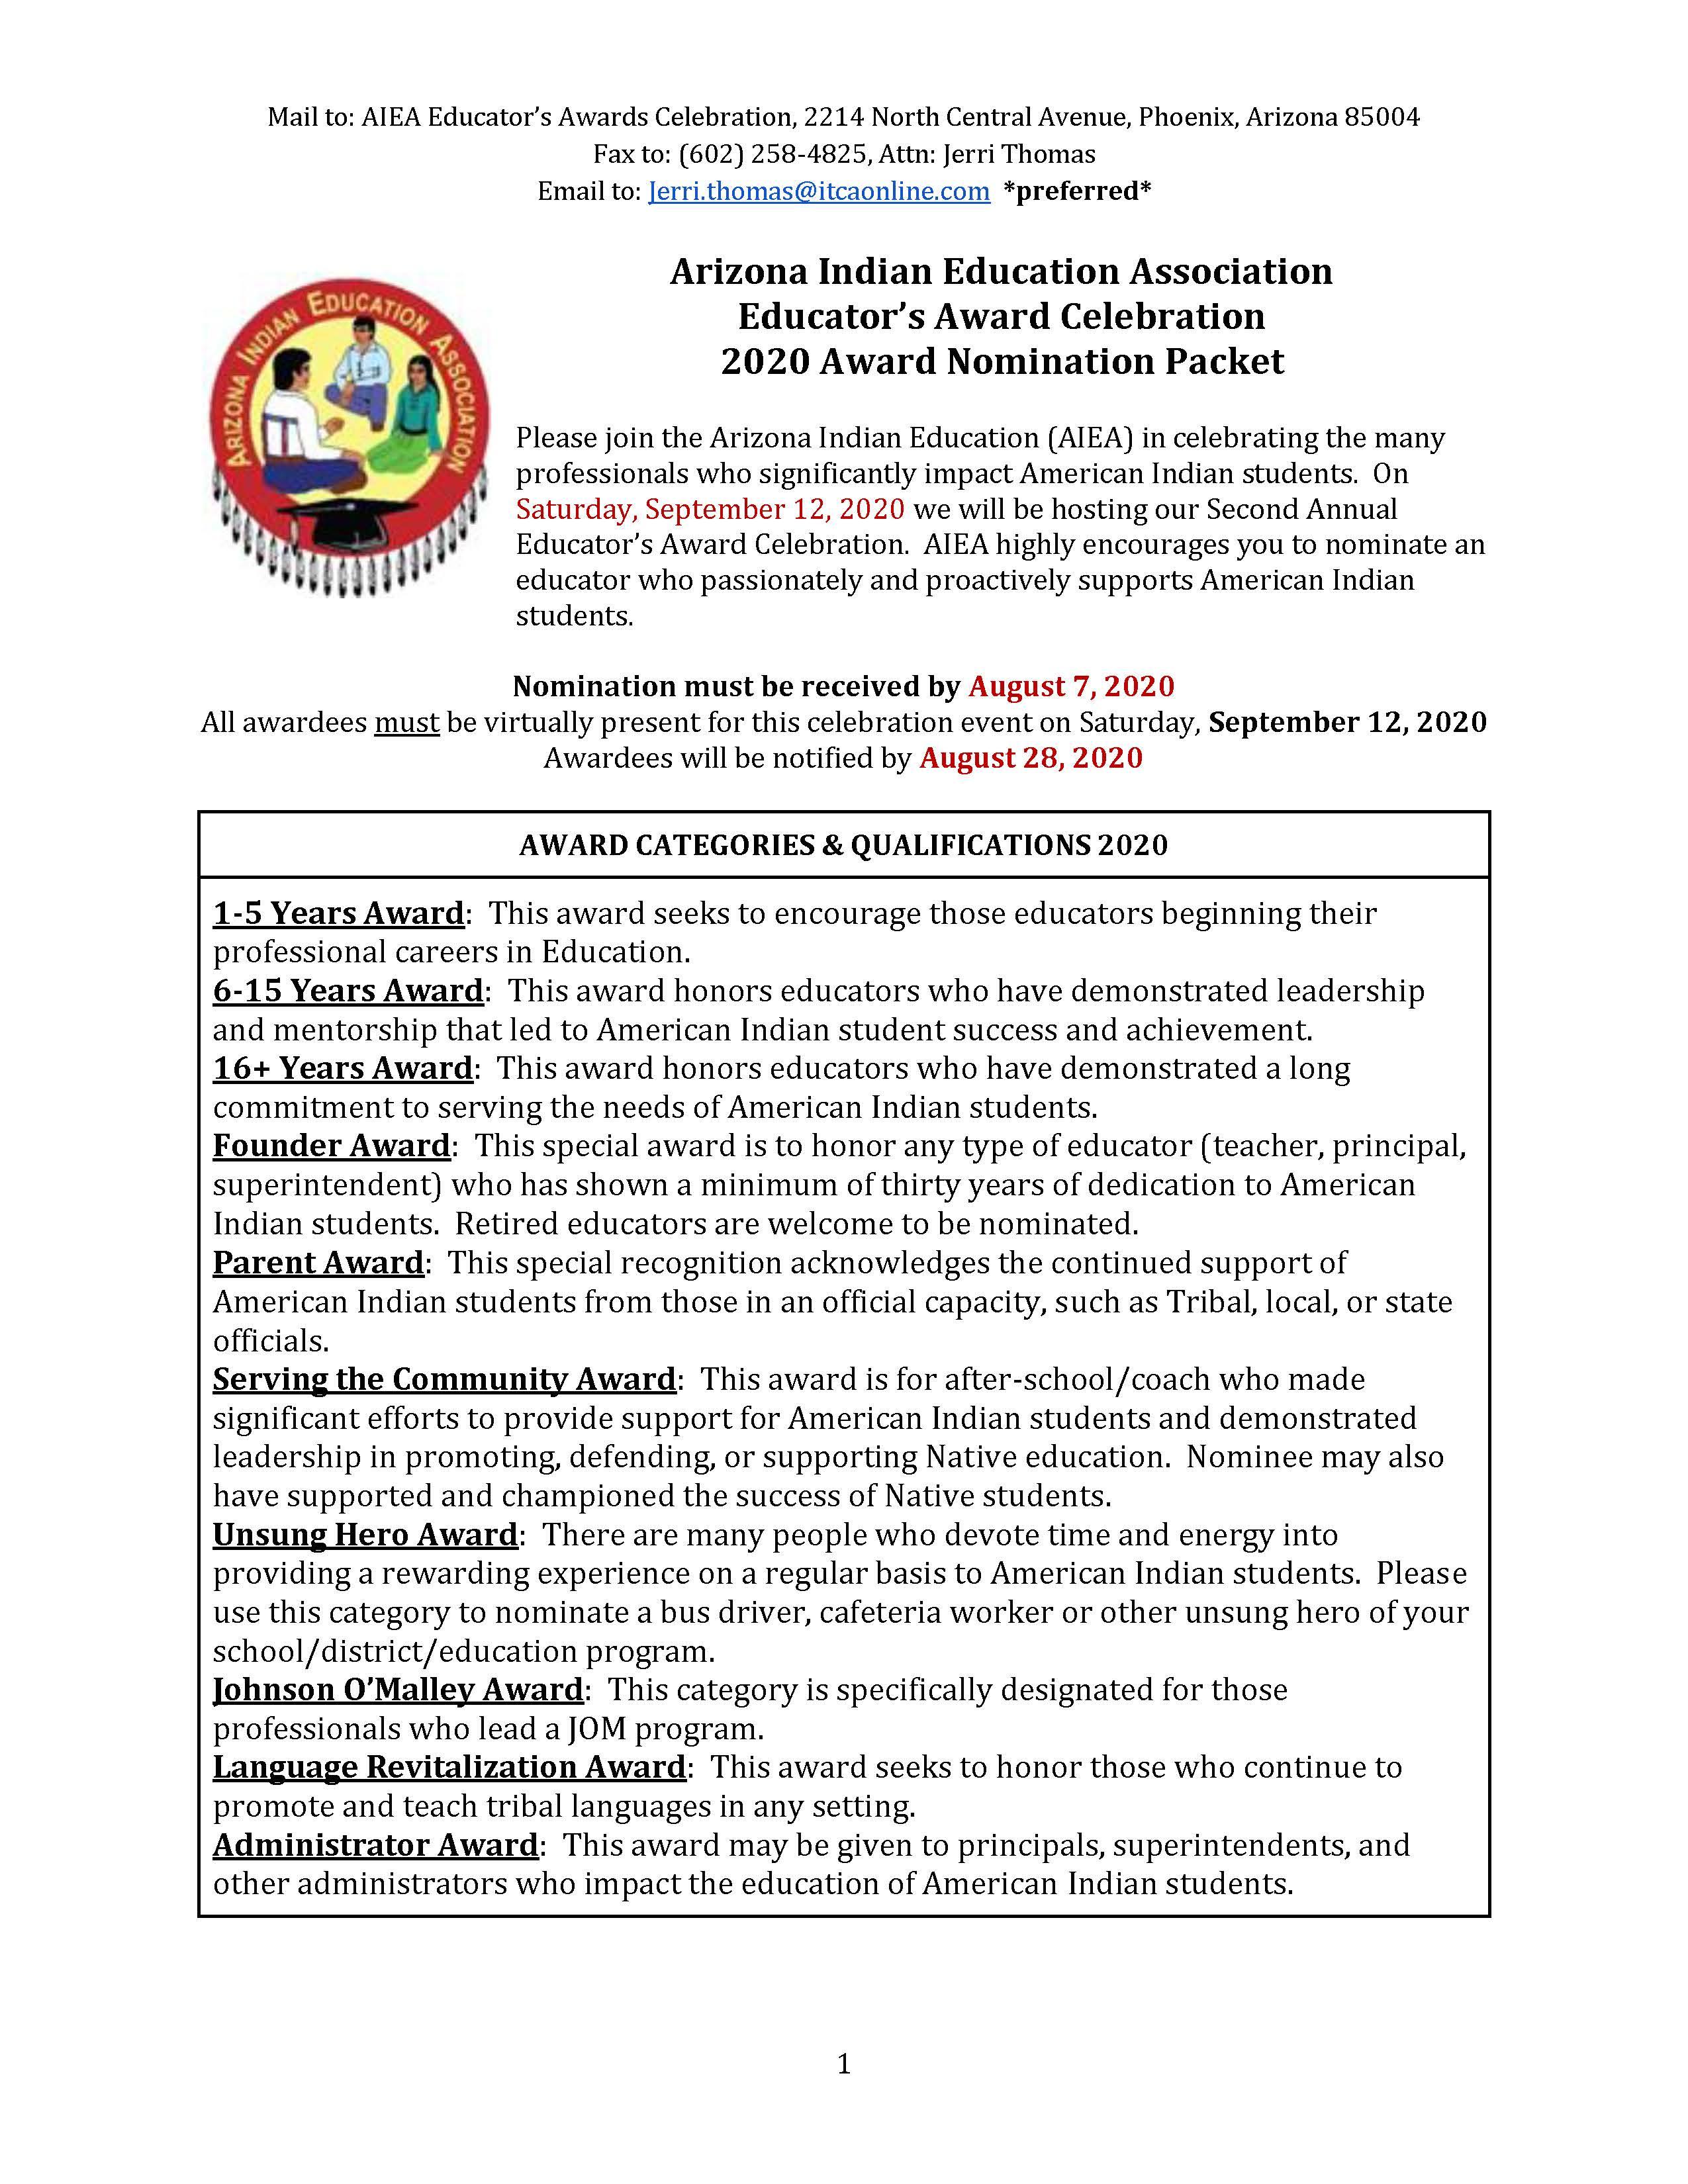 AIEA Award Nomination Packet